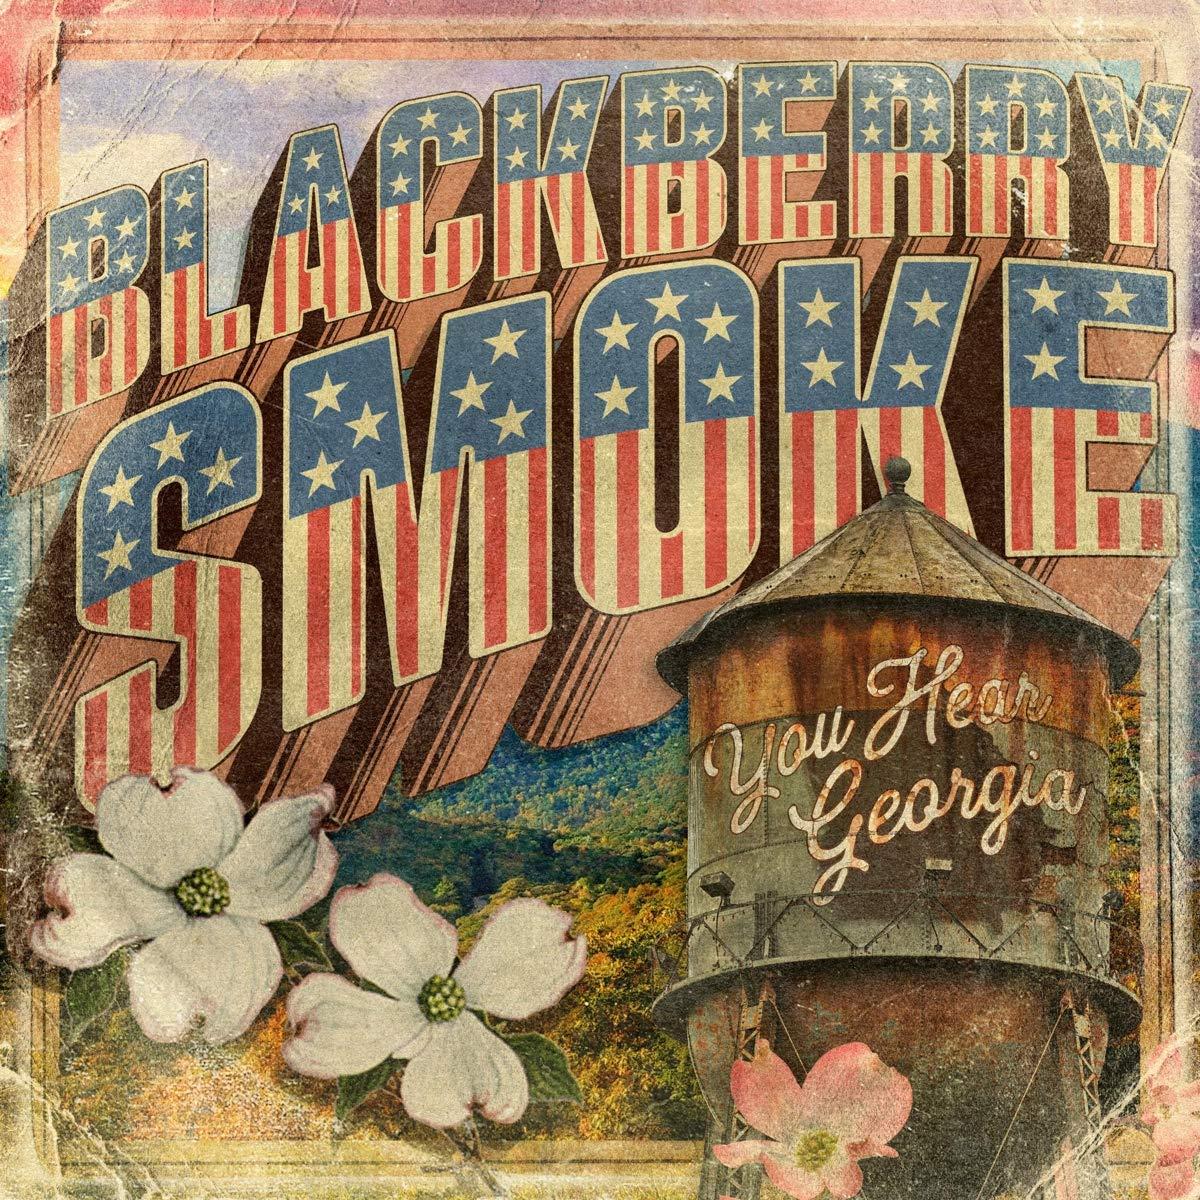 Blackberry Smoke - You Hear Georgia [LTD 2xLP] Sun Yellow Vinyl)